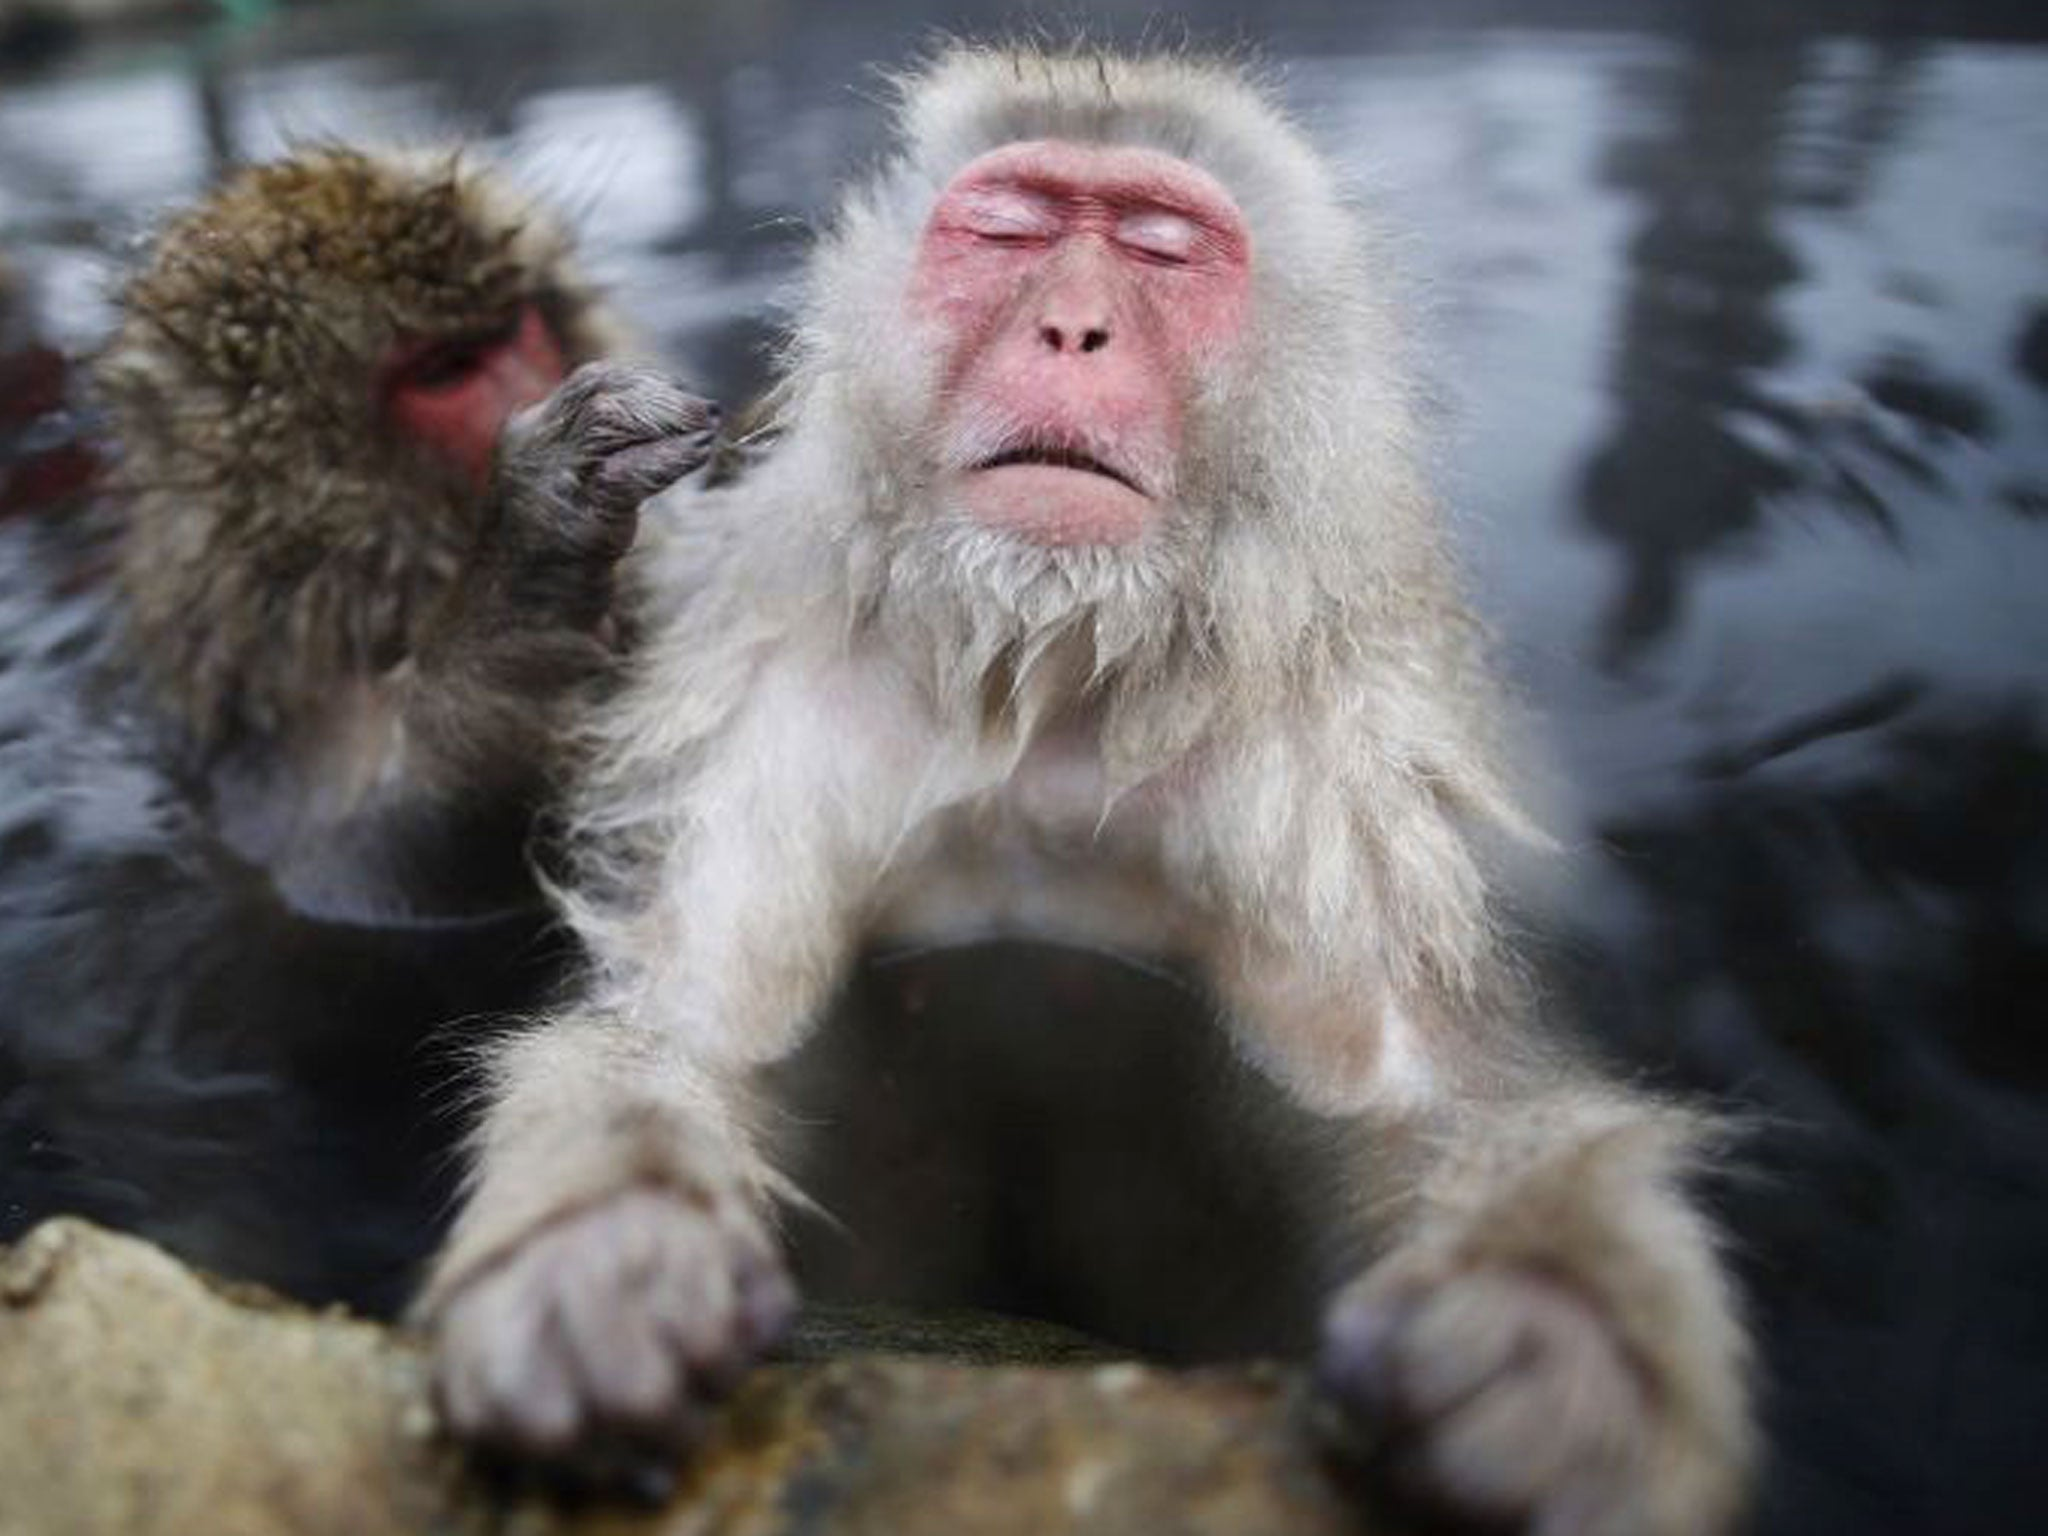 Nake sex with monkey